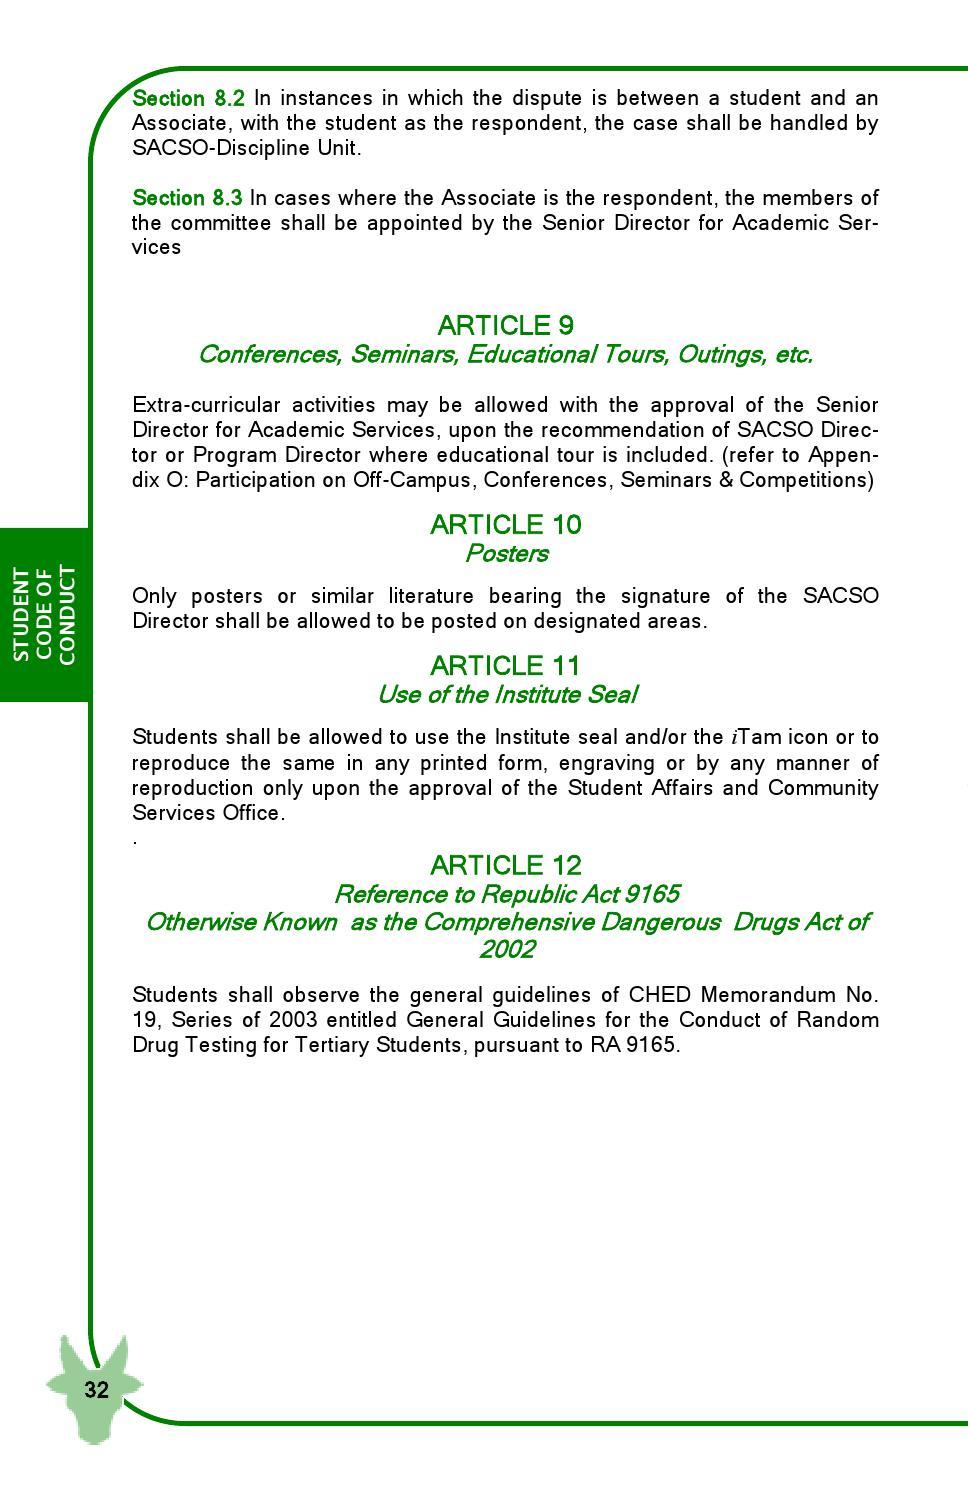 FEU Tech Student Handbook 2014 Edition by FEU Tech - issuu